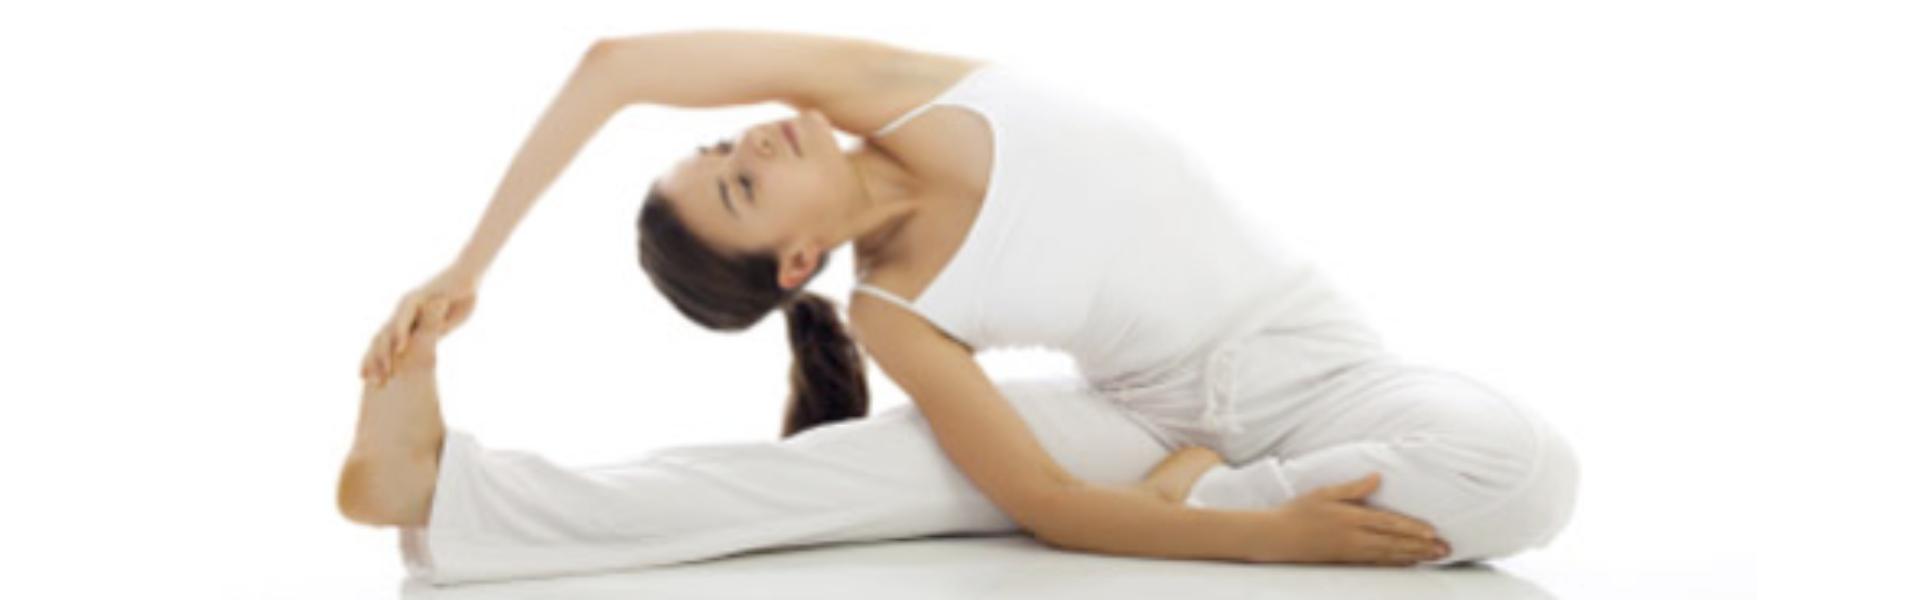 Shiatsu and stretching